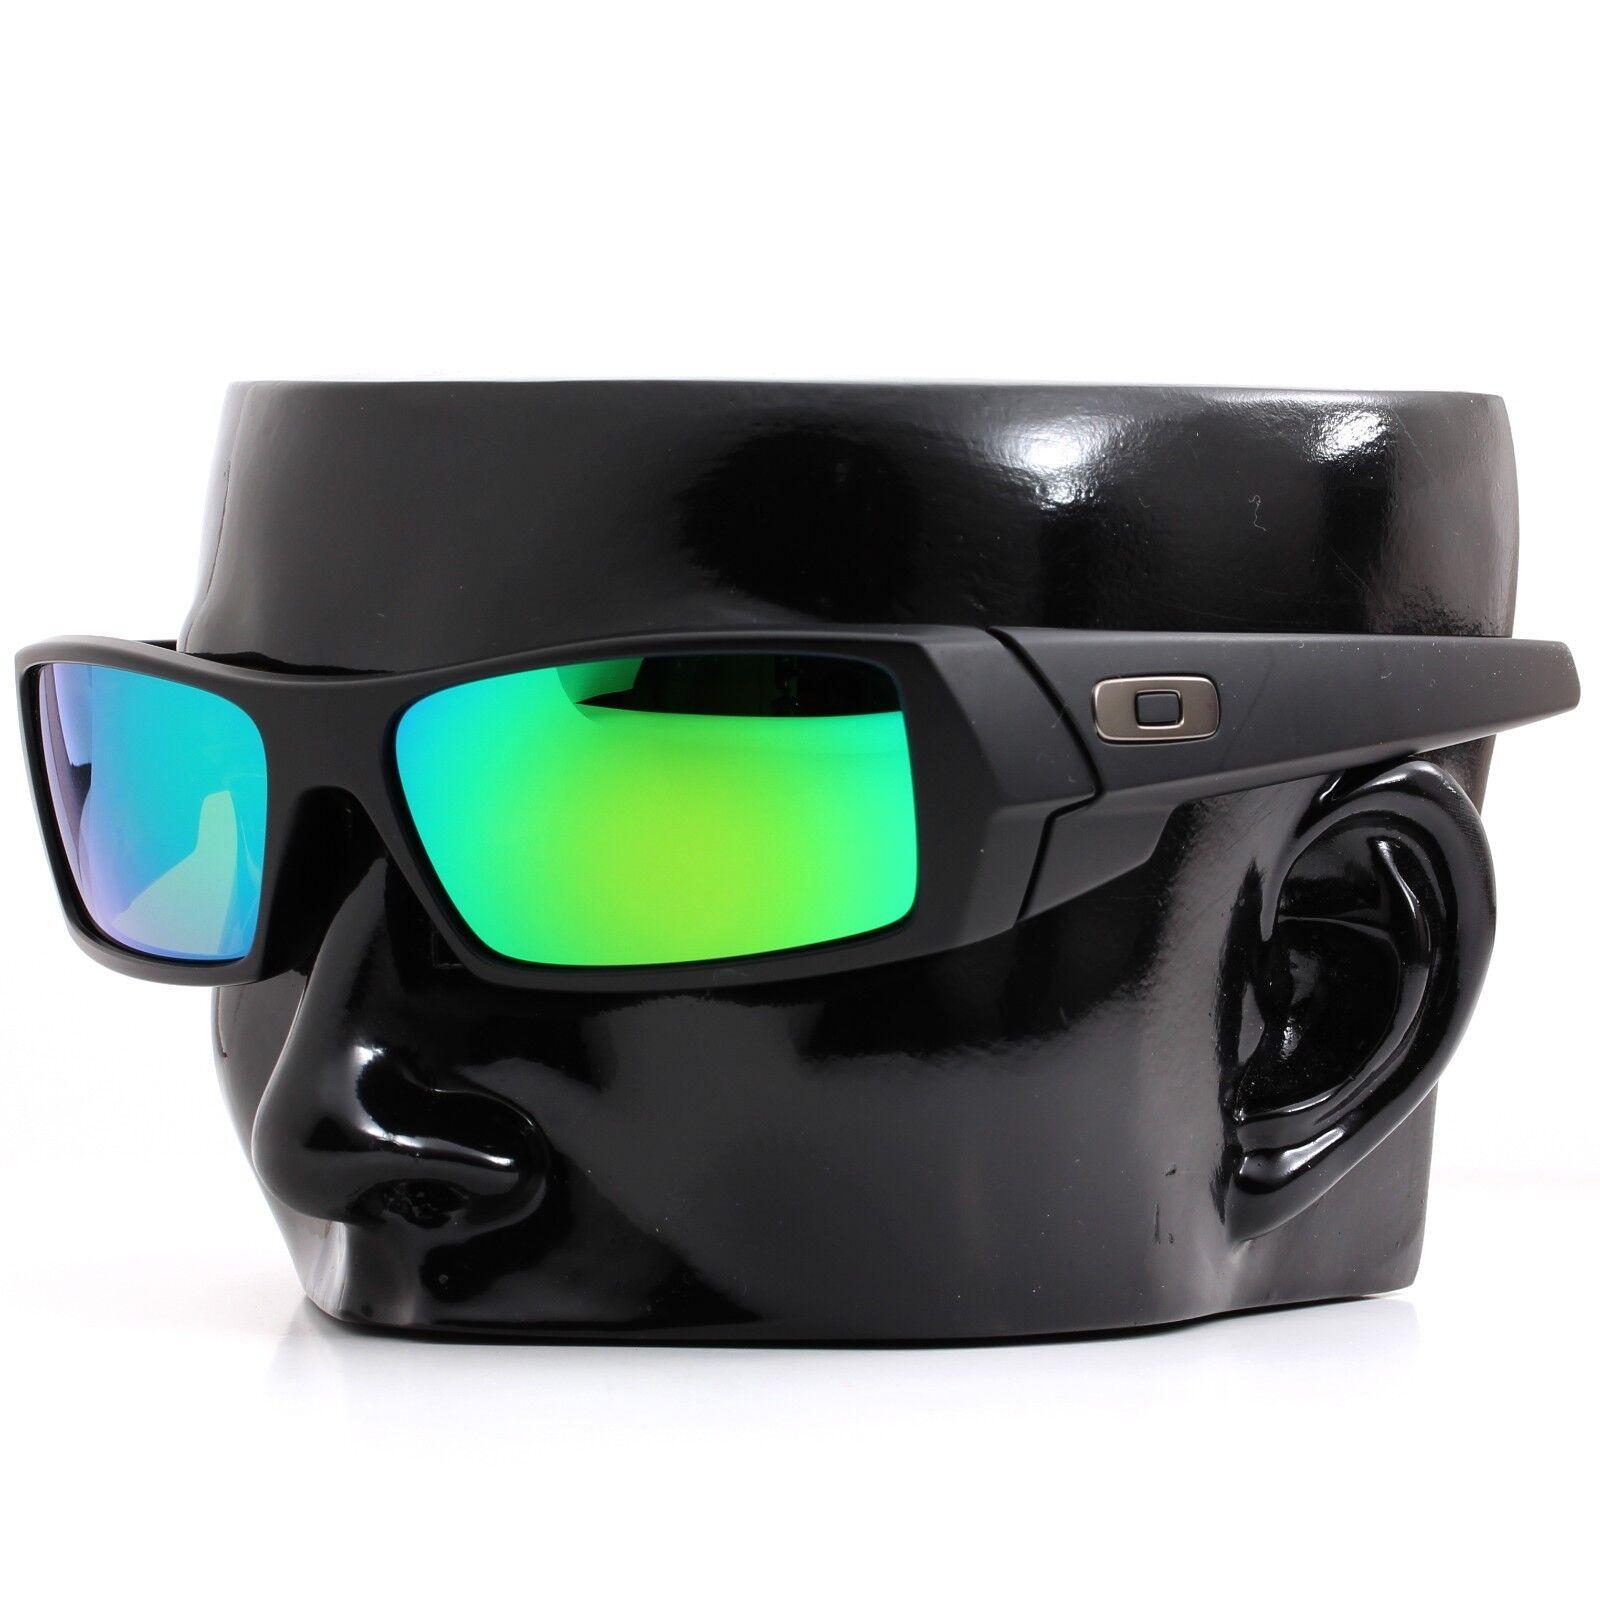 c366fe8486d Polarized IKON Iridium Replacement Lenses For Oakley Gascan Emerald Green  Mirror